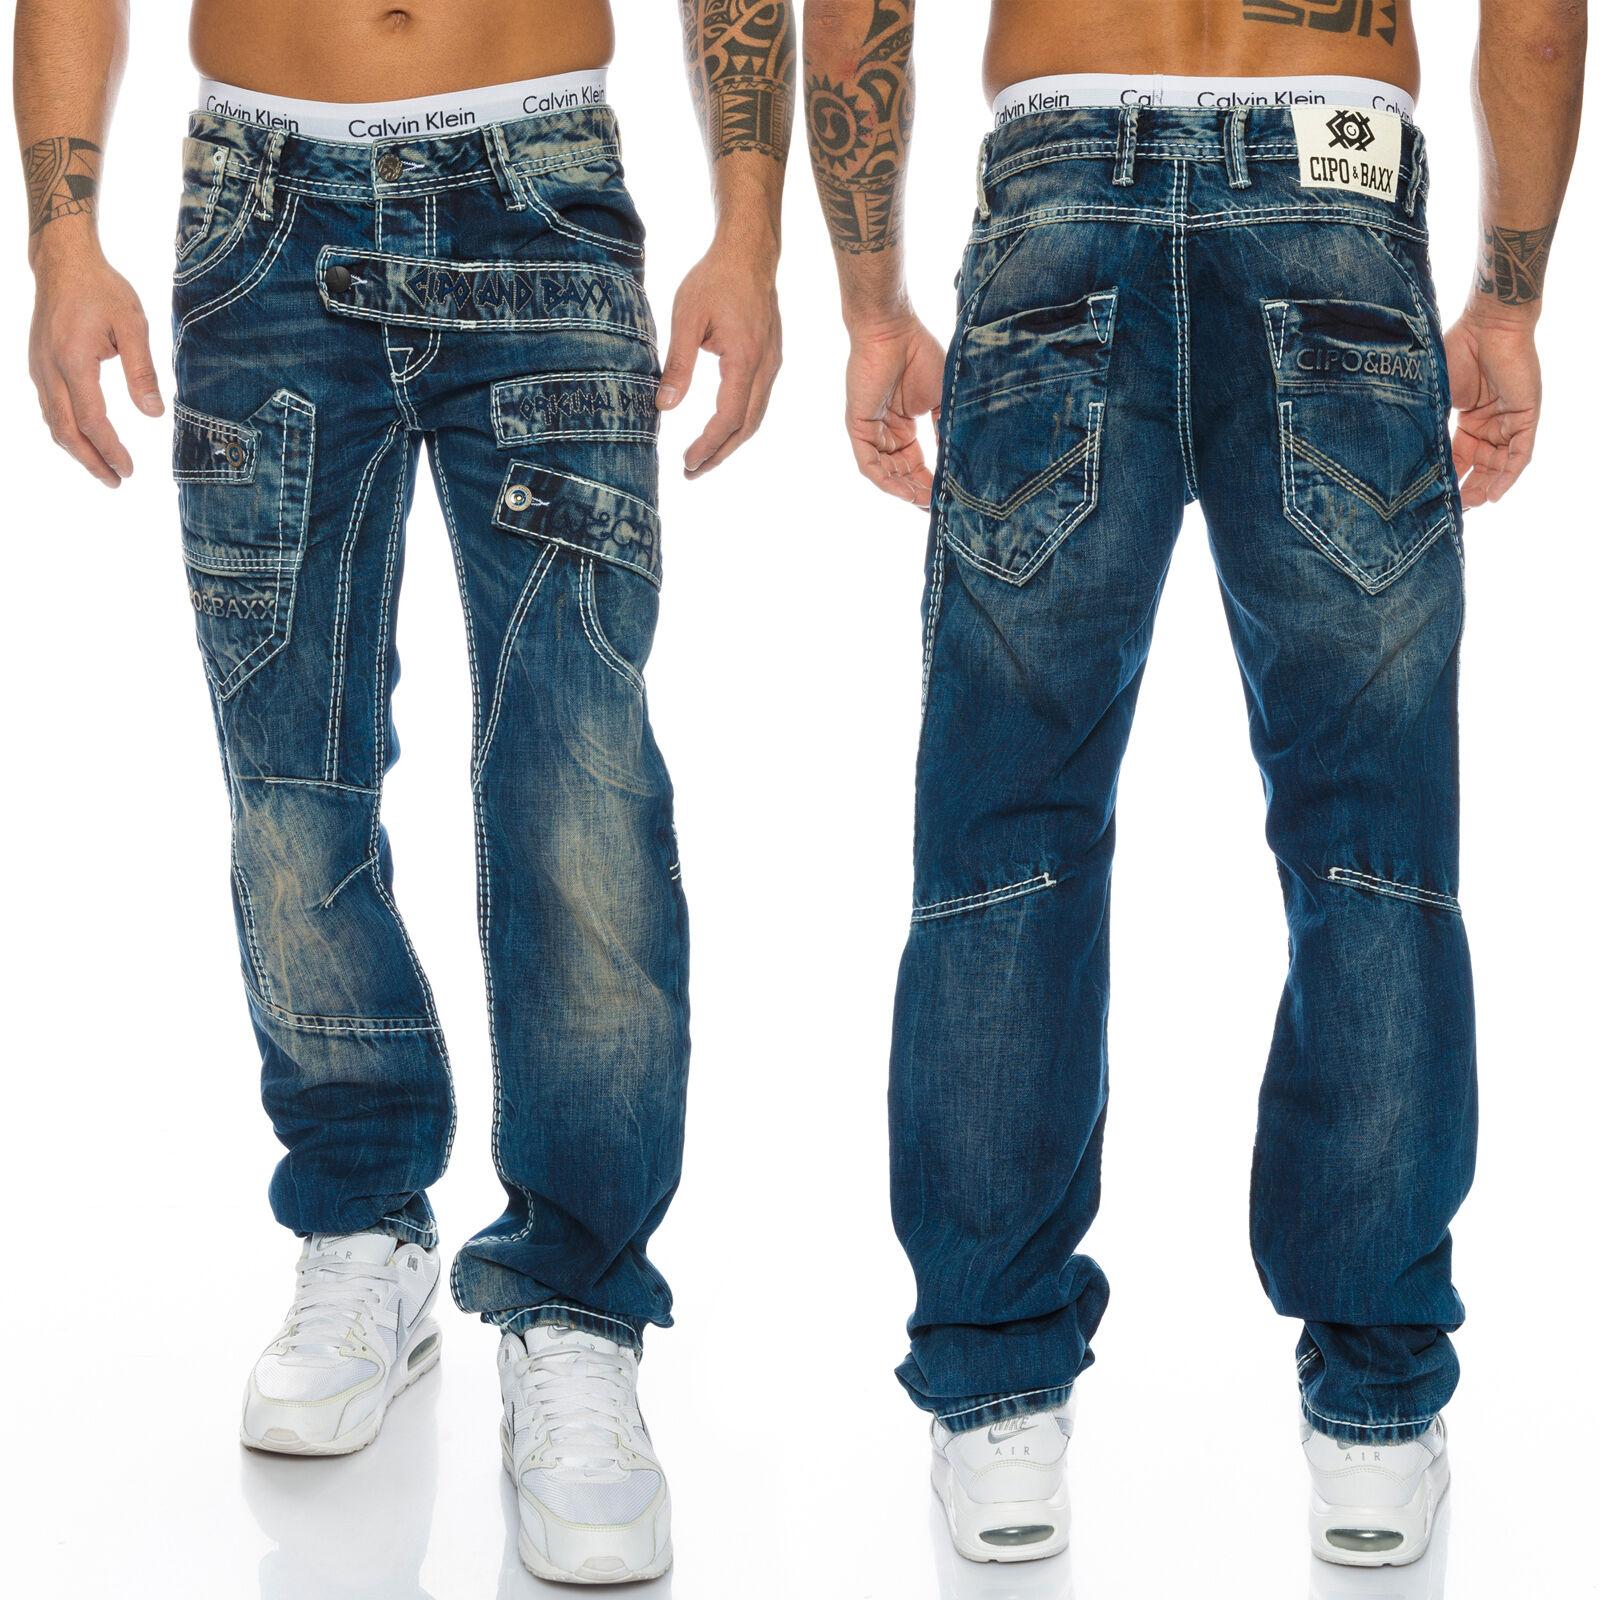 Cipo & Baxx Cuciture Uomo Pantaloni Jeans 1198 BLU NUOVO w28 29 30 31 32 33 34 36 38 40